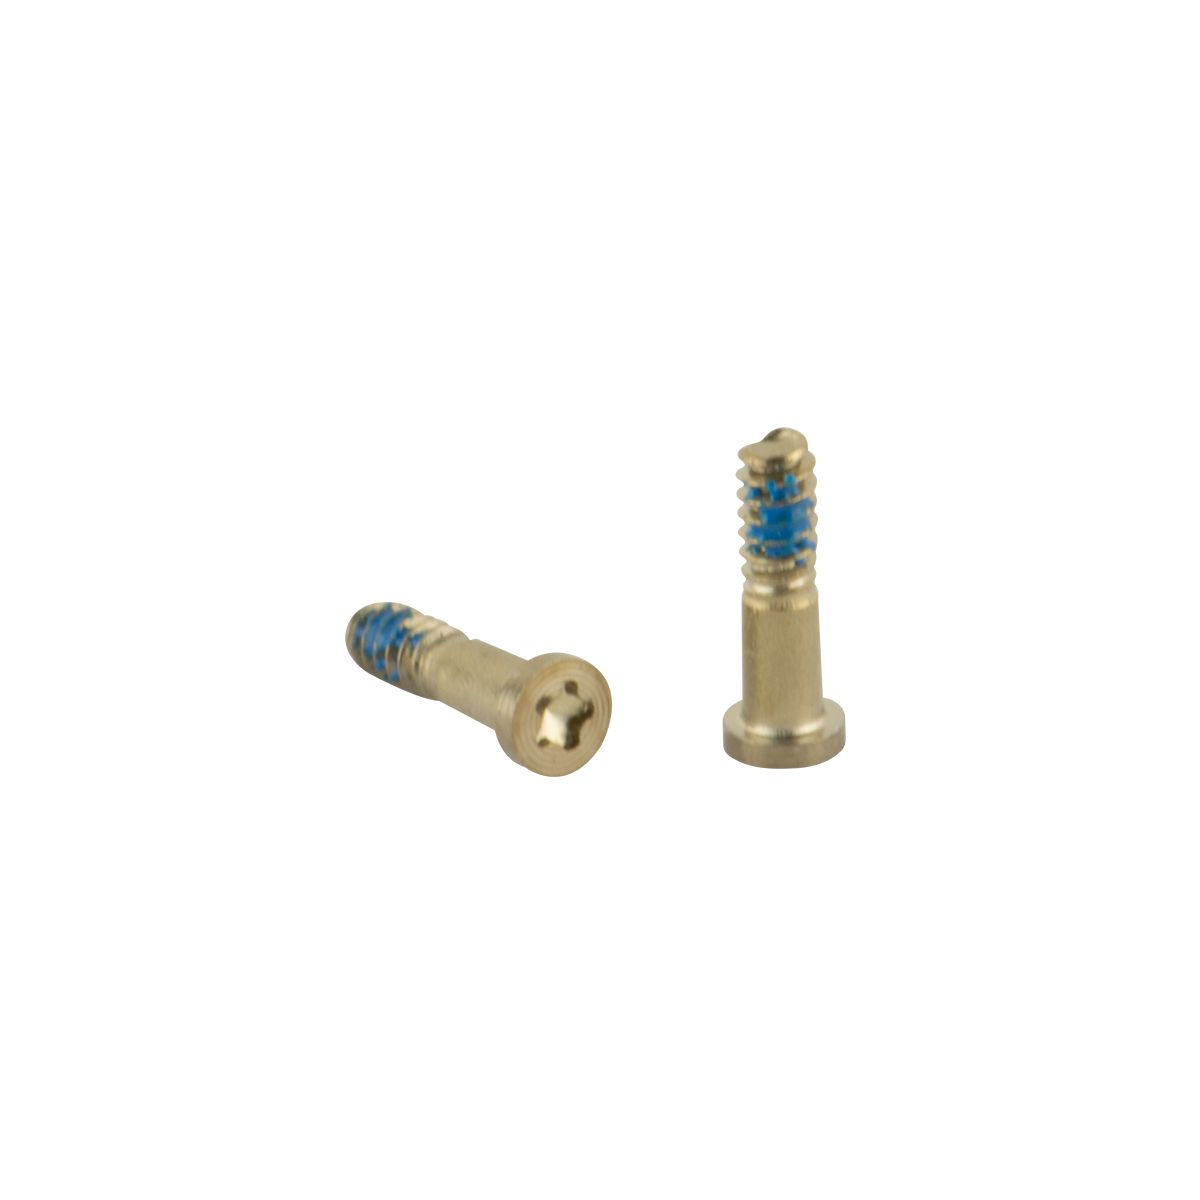 Iphone5S,iPhone5,iPhone SE screws set gold 2pcs